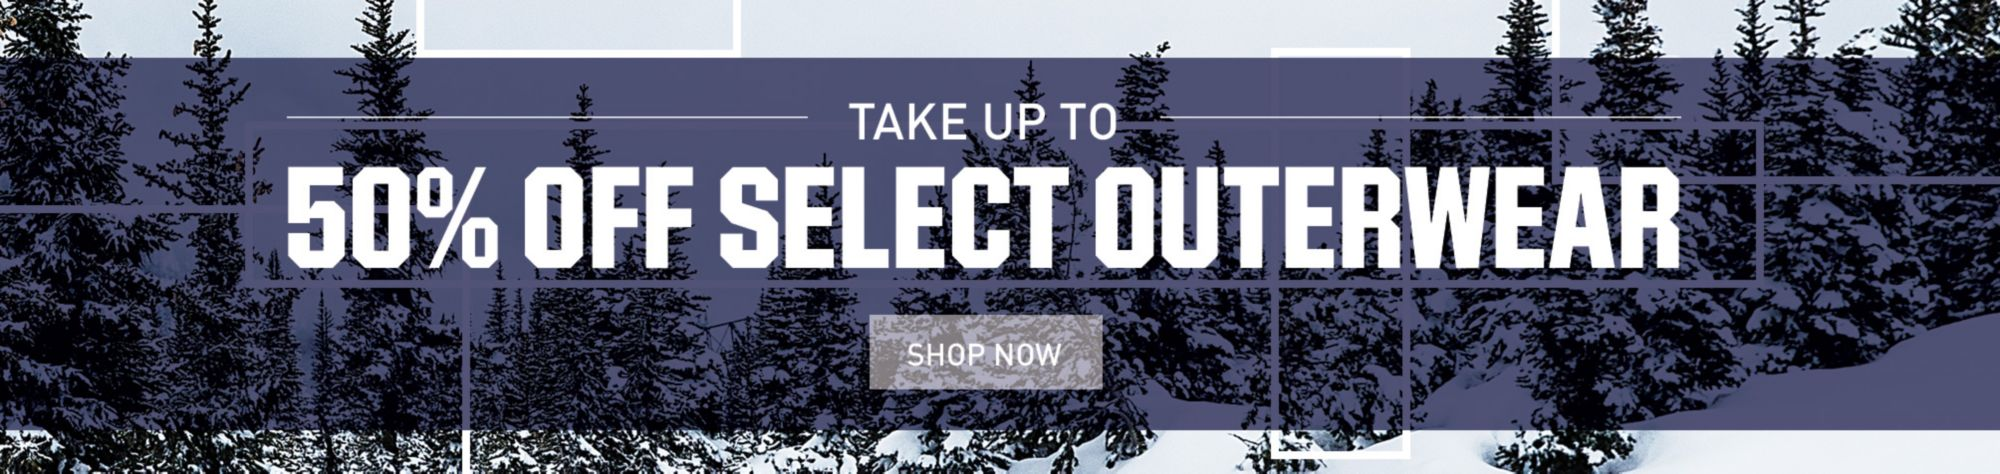 End Of Season Outerwear Savings